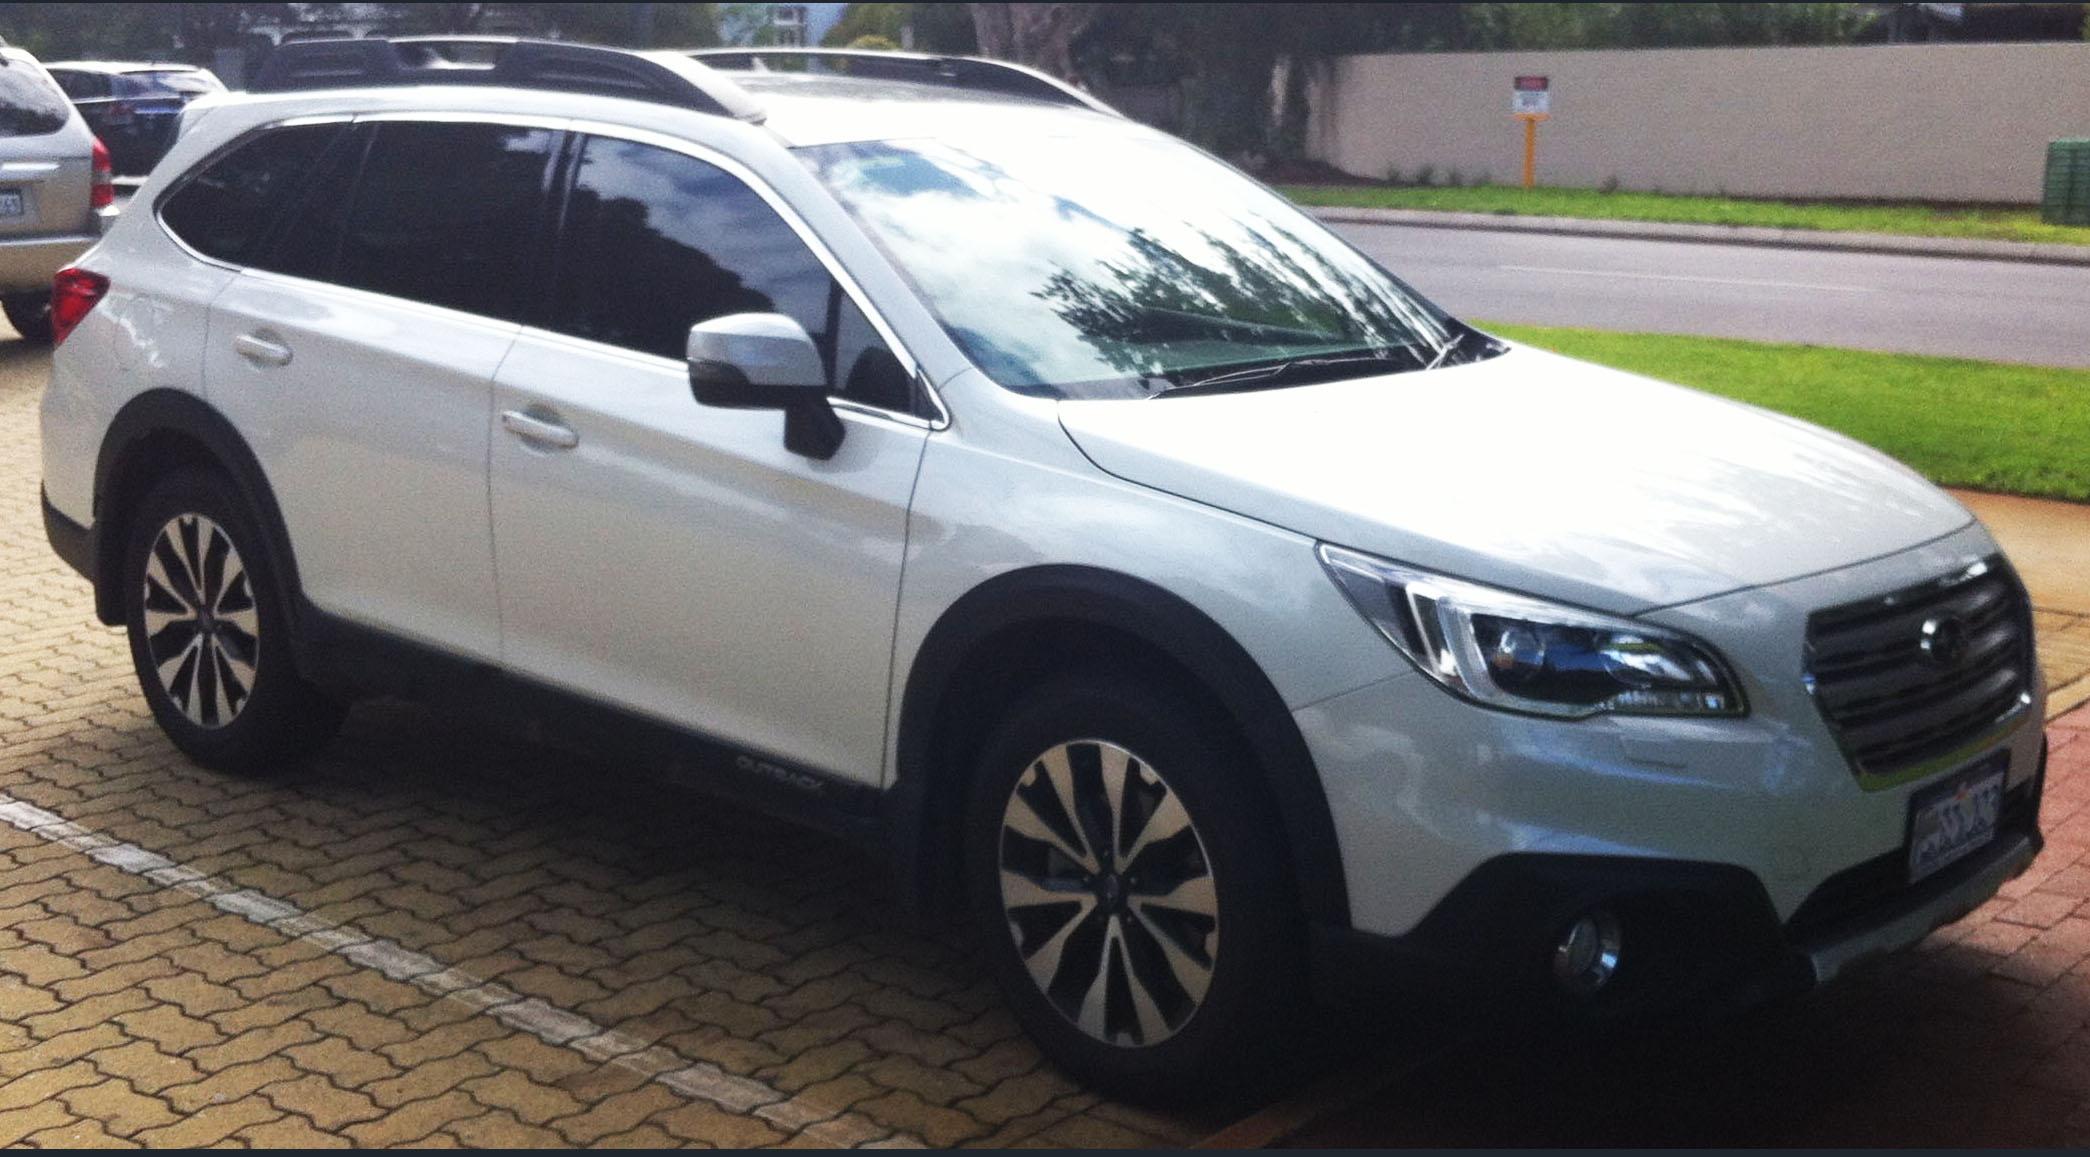 file:2015 subaru outback (bs9 my15) 2.5i premium station wagon